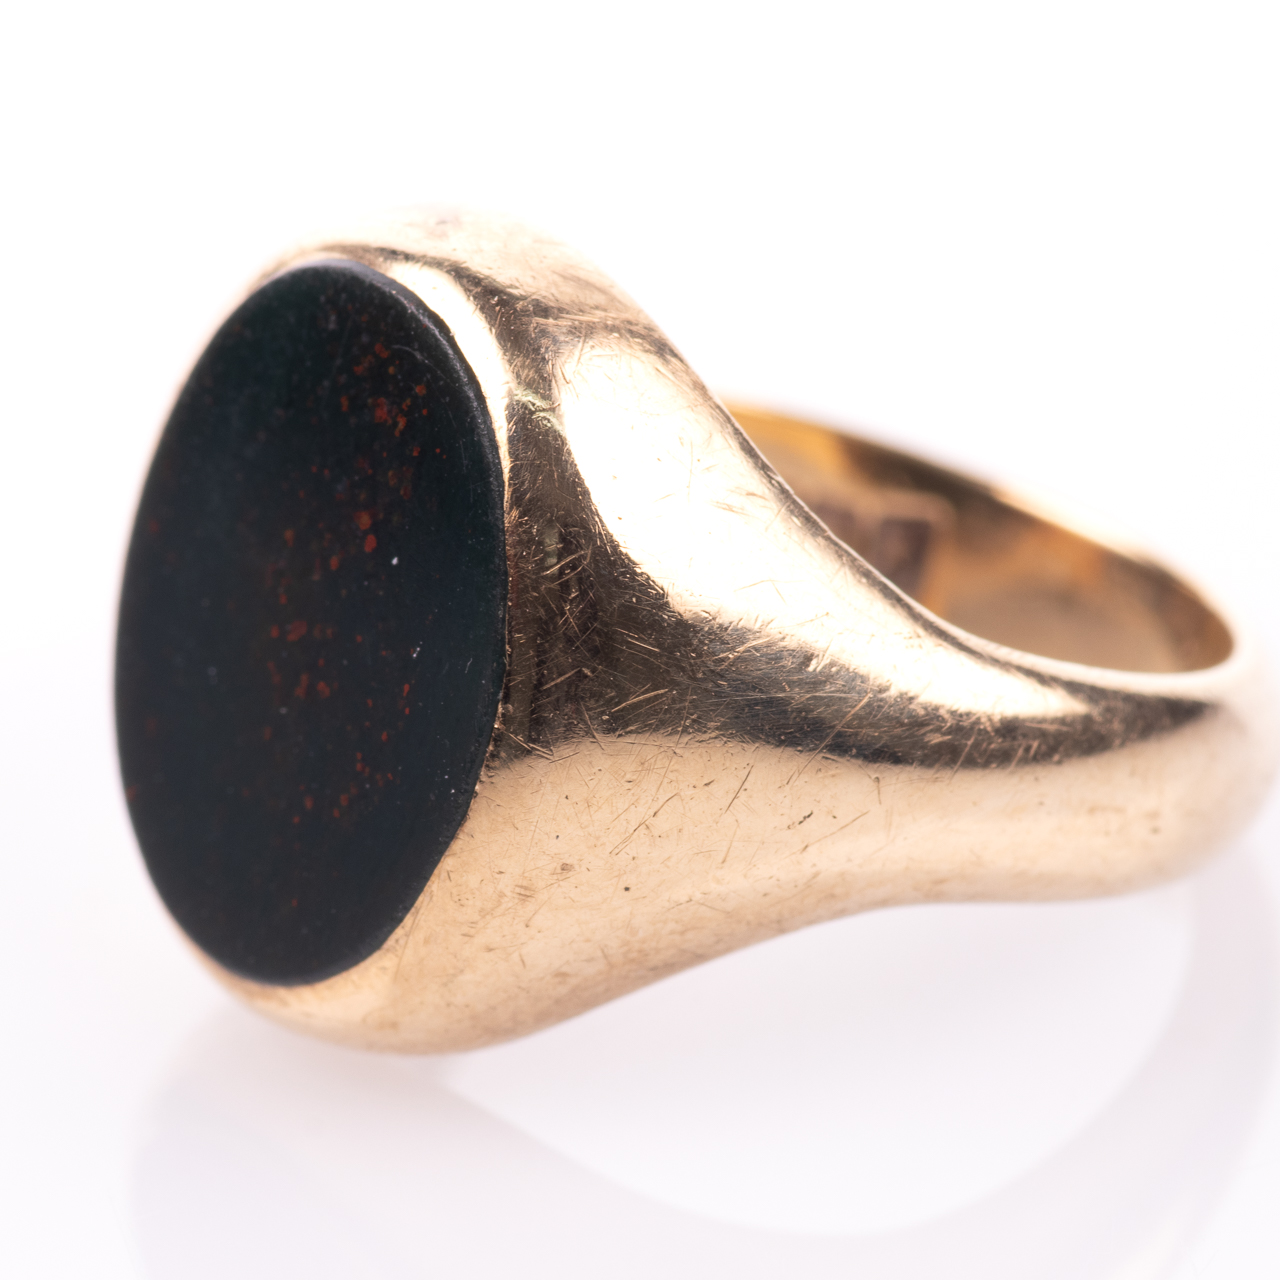 9ct Gold Bloodstone Birmingham Signet Ring - Image 4 of 7